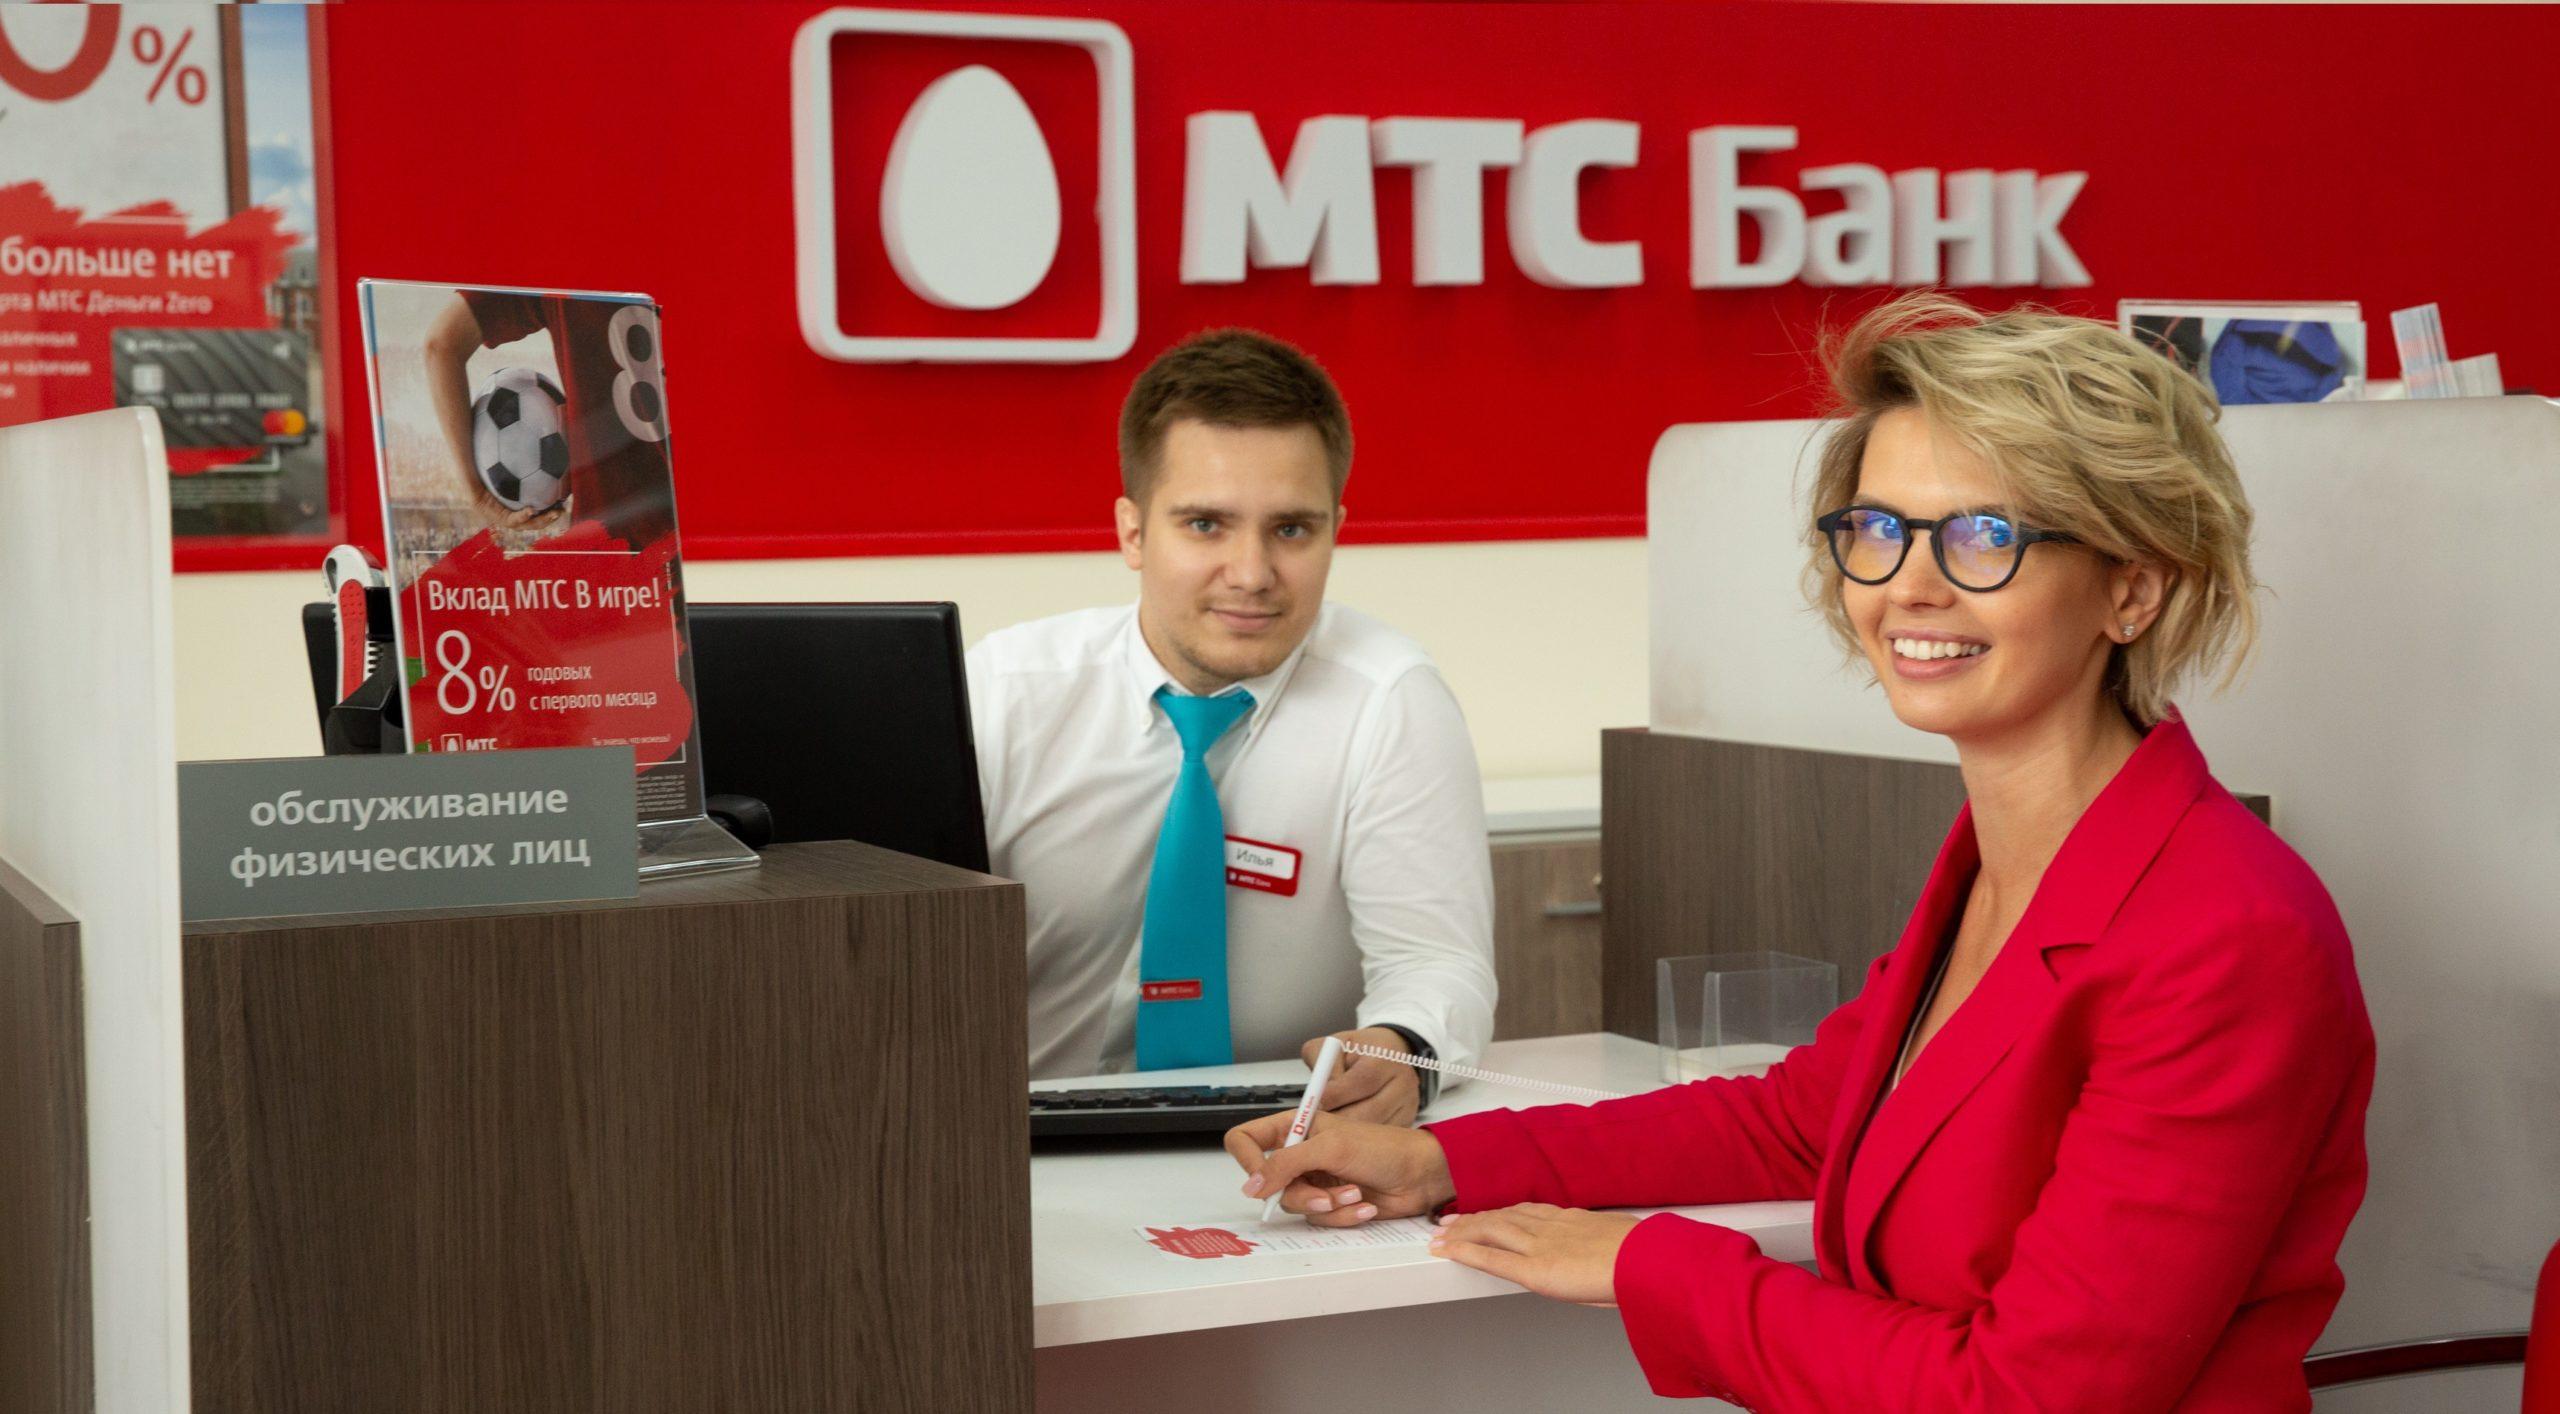 кредит МТС Банка